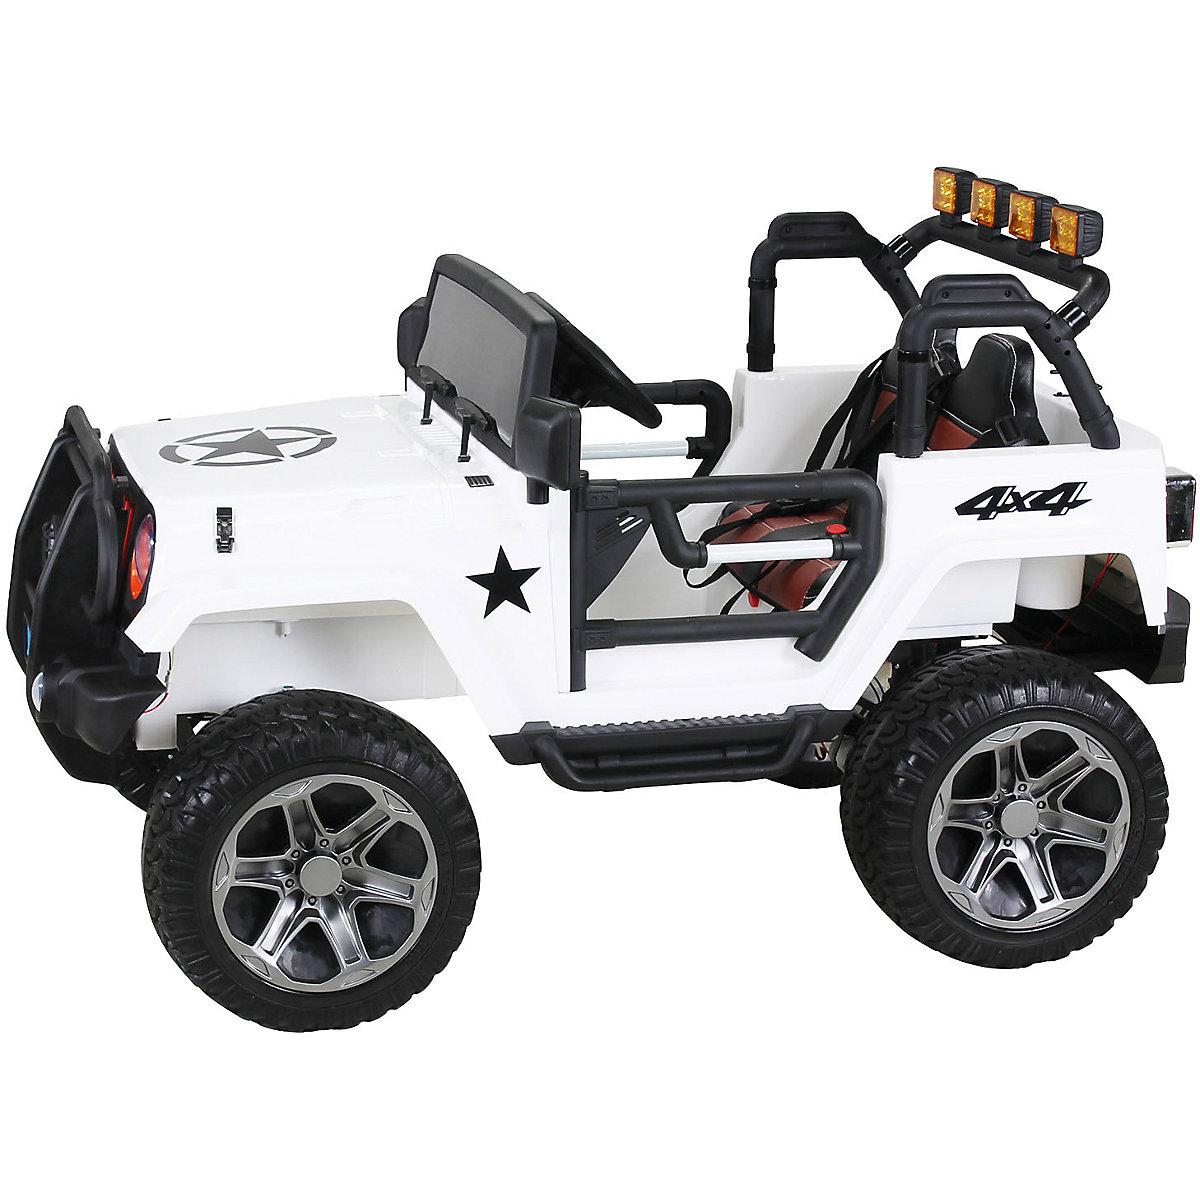 kinder elektroauto wrangler offroad jeep allrad 2 sitzer wei mytoys. Black Bedroom Furniture Sets. Home Design Ideas